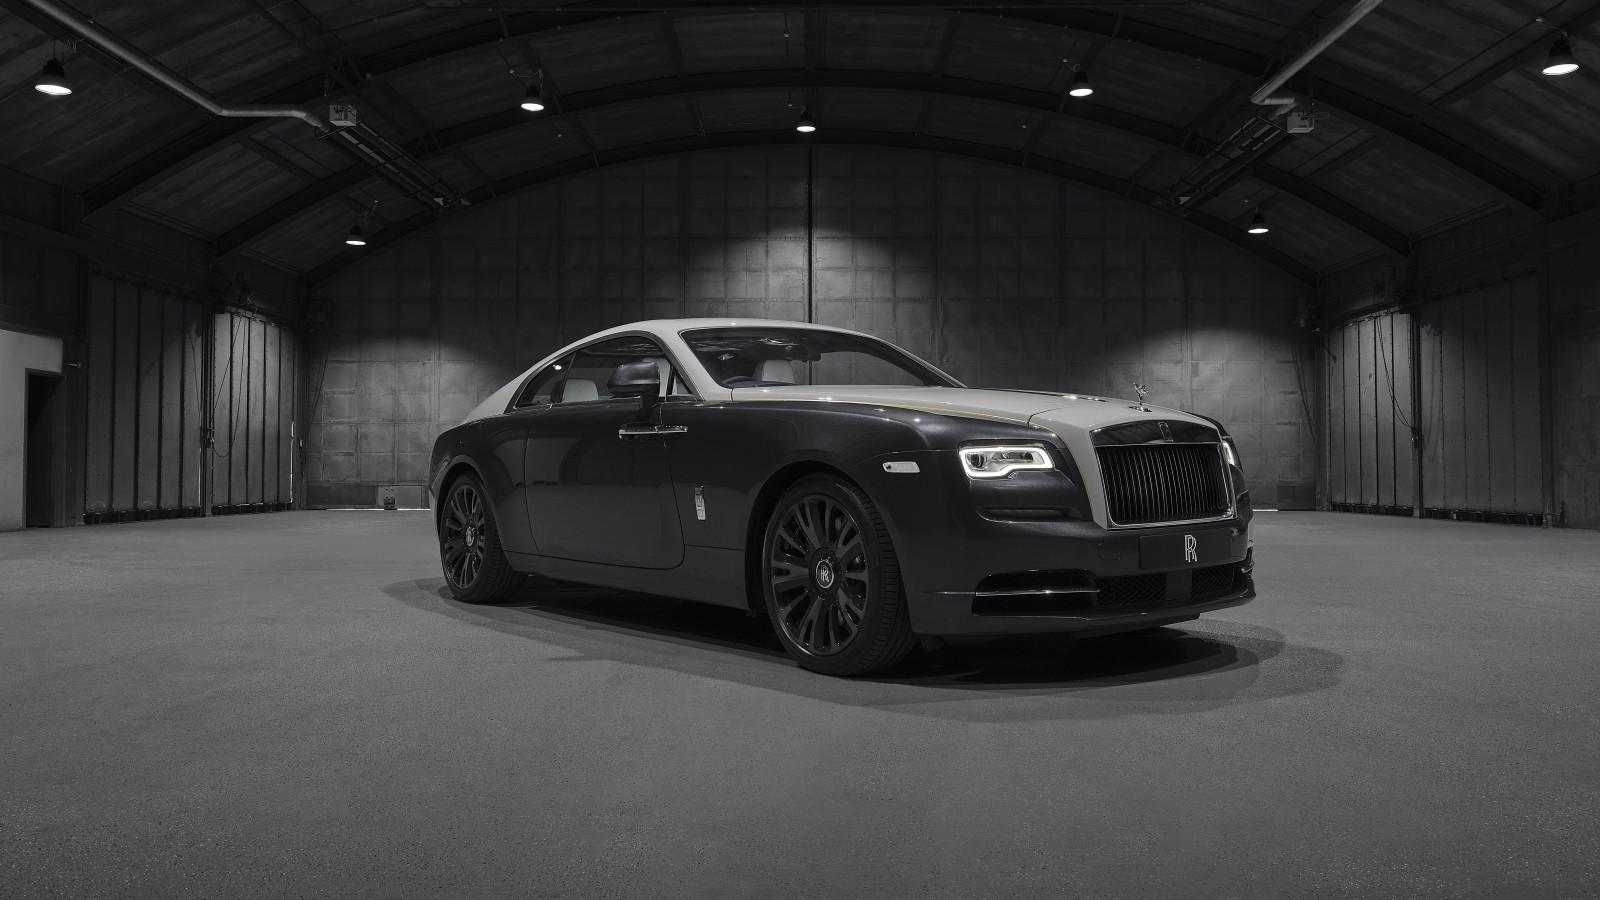 Rolls Royce Wraith Black Badge >> Rolls-Royce Wraith Eagle VIII 2019 5K Wallpaper | HD Car Wallpapers | ID #12675